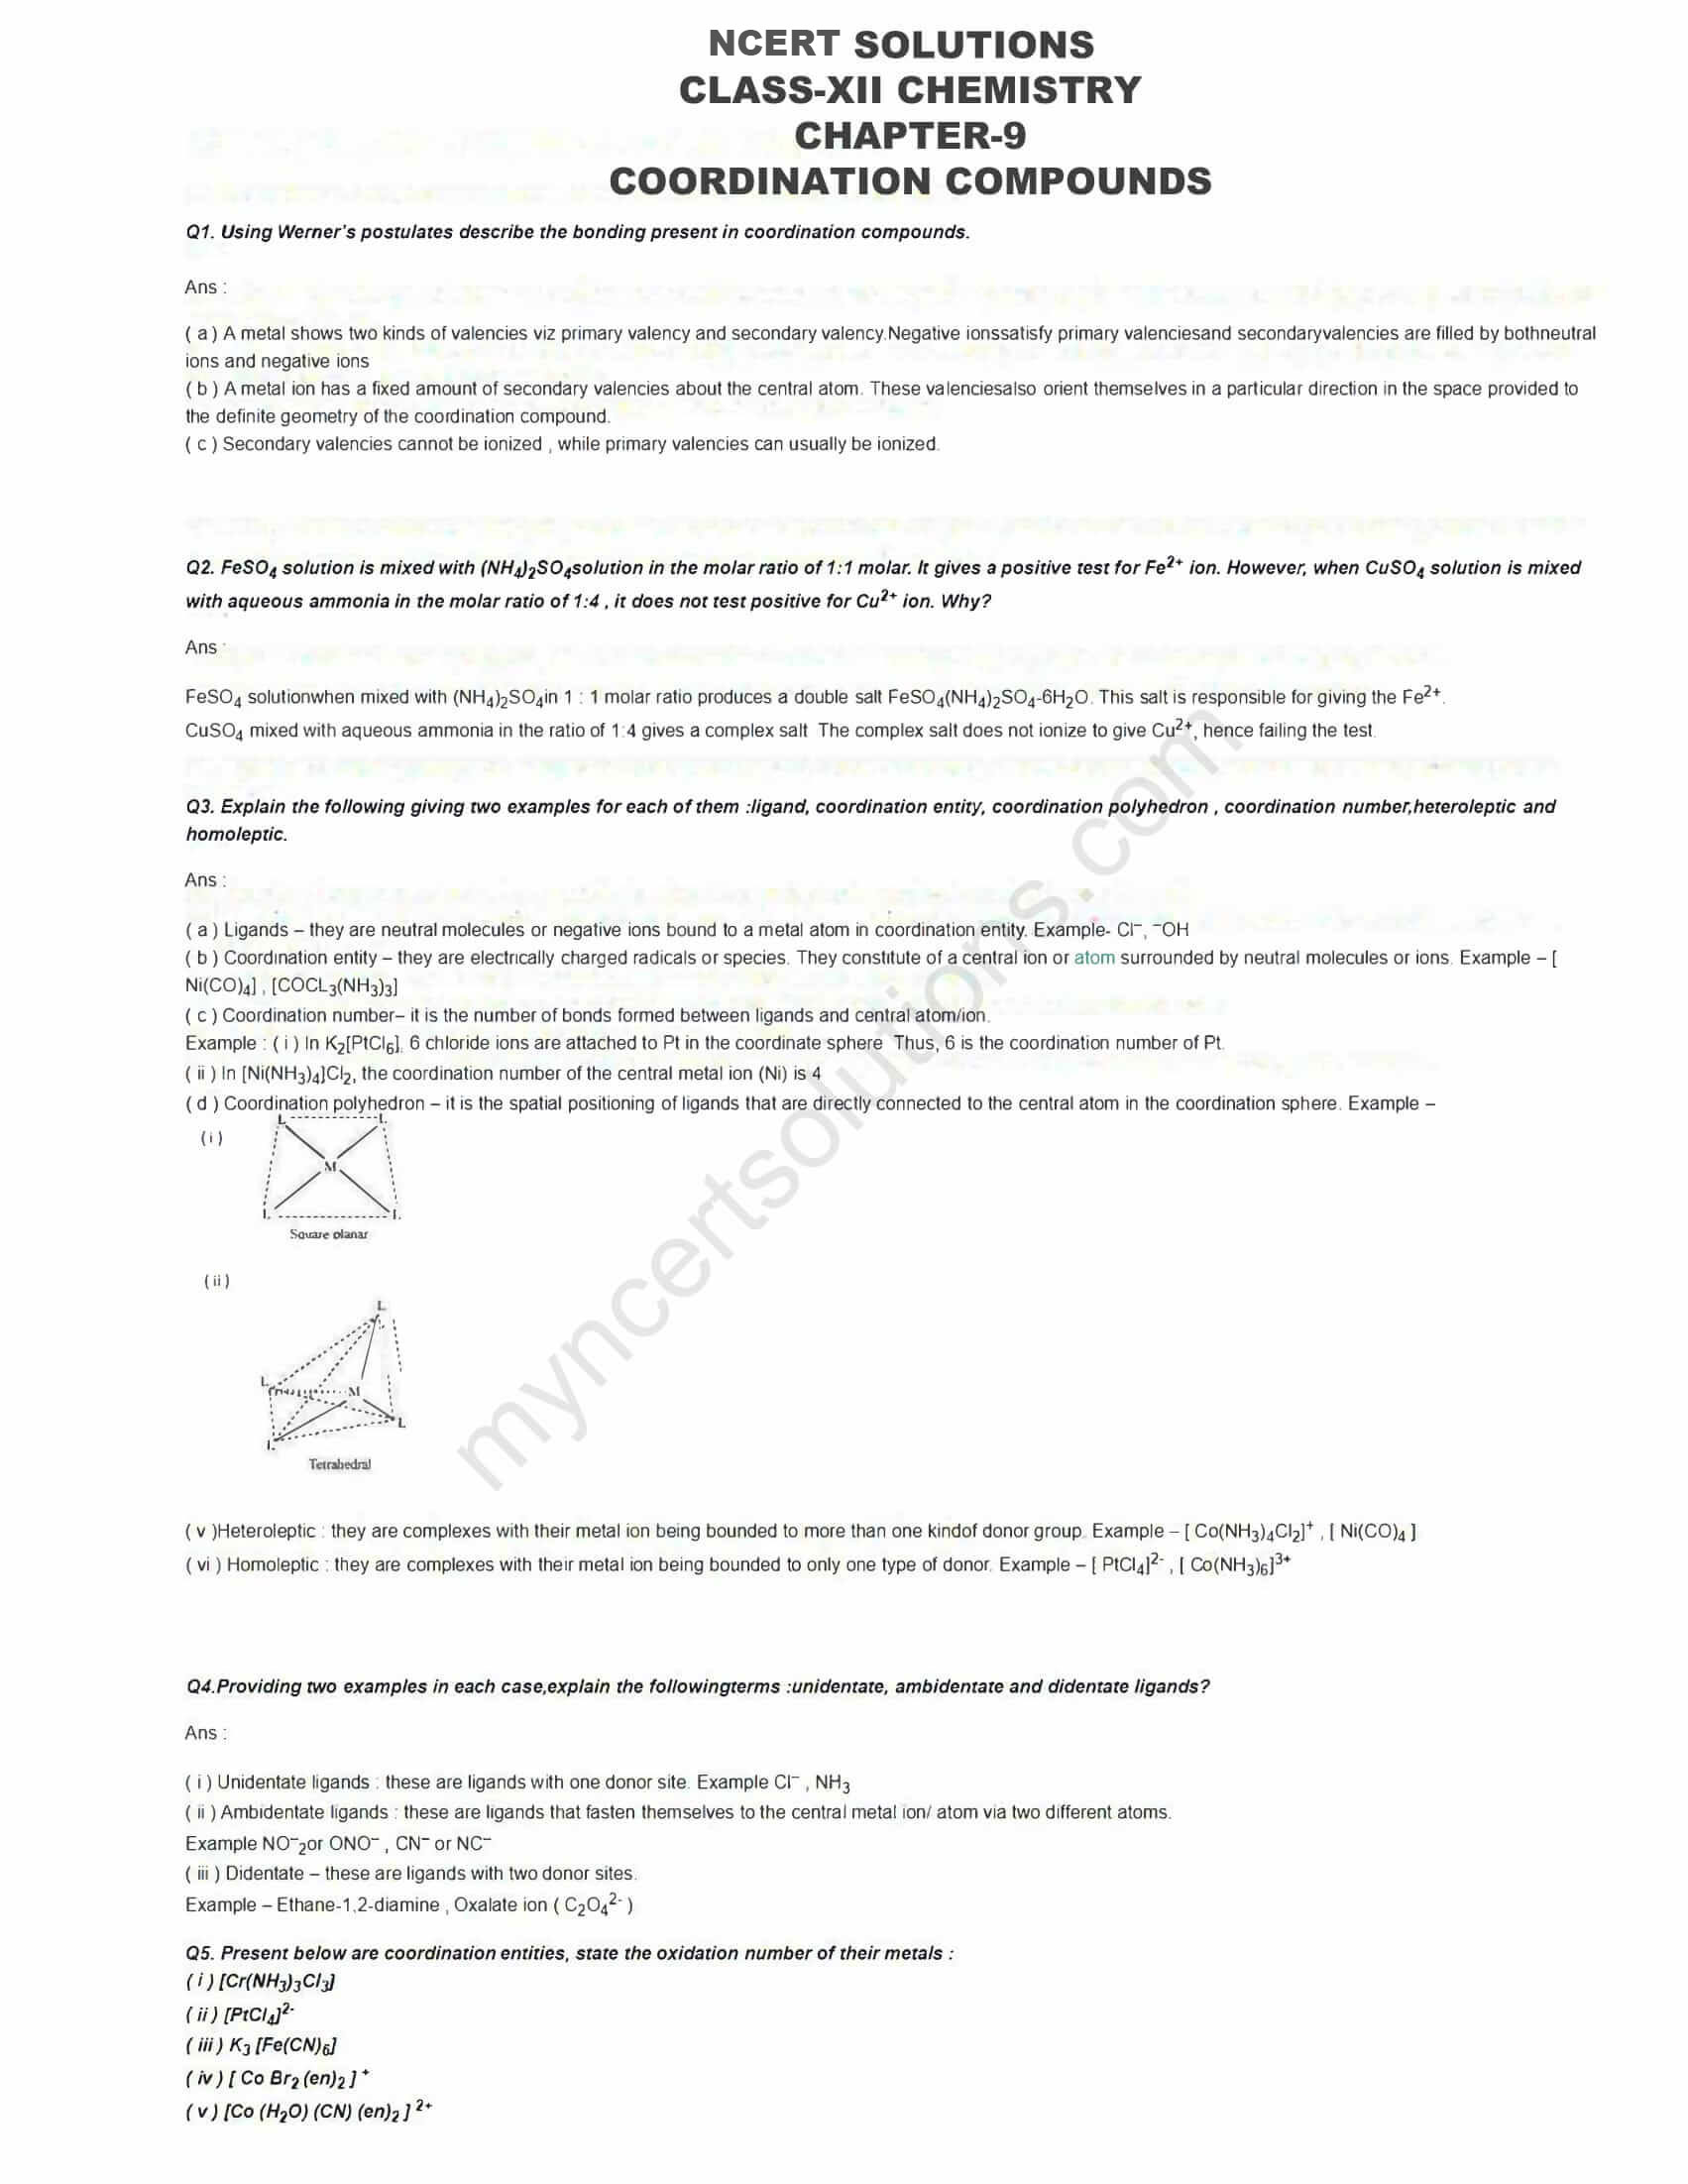 Coordination Compounds Ncert Solutions Pdf